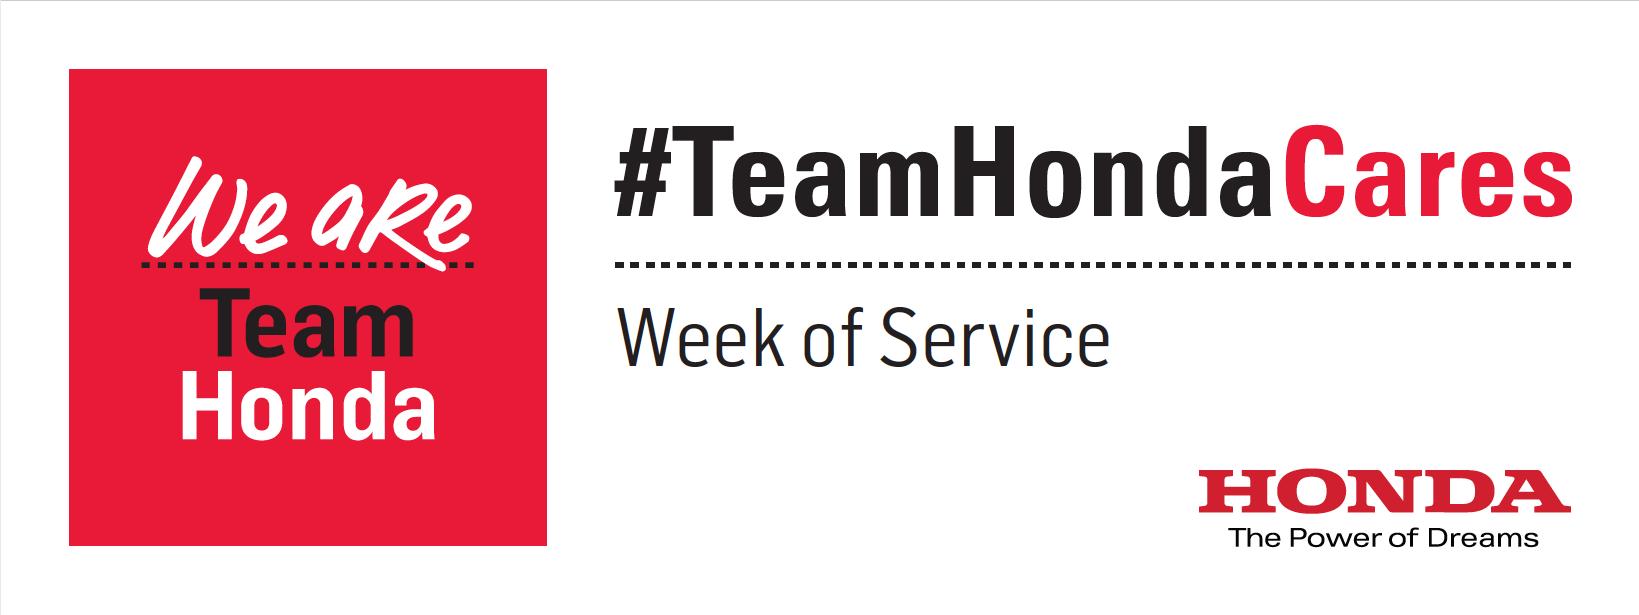 Week Of Service